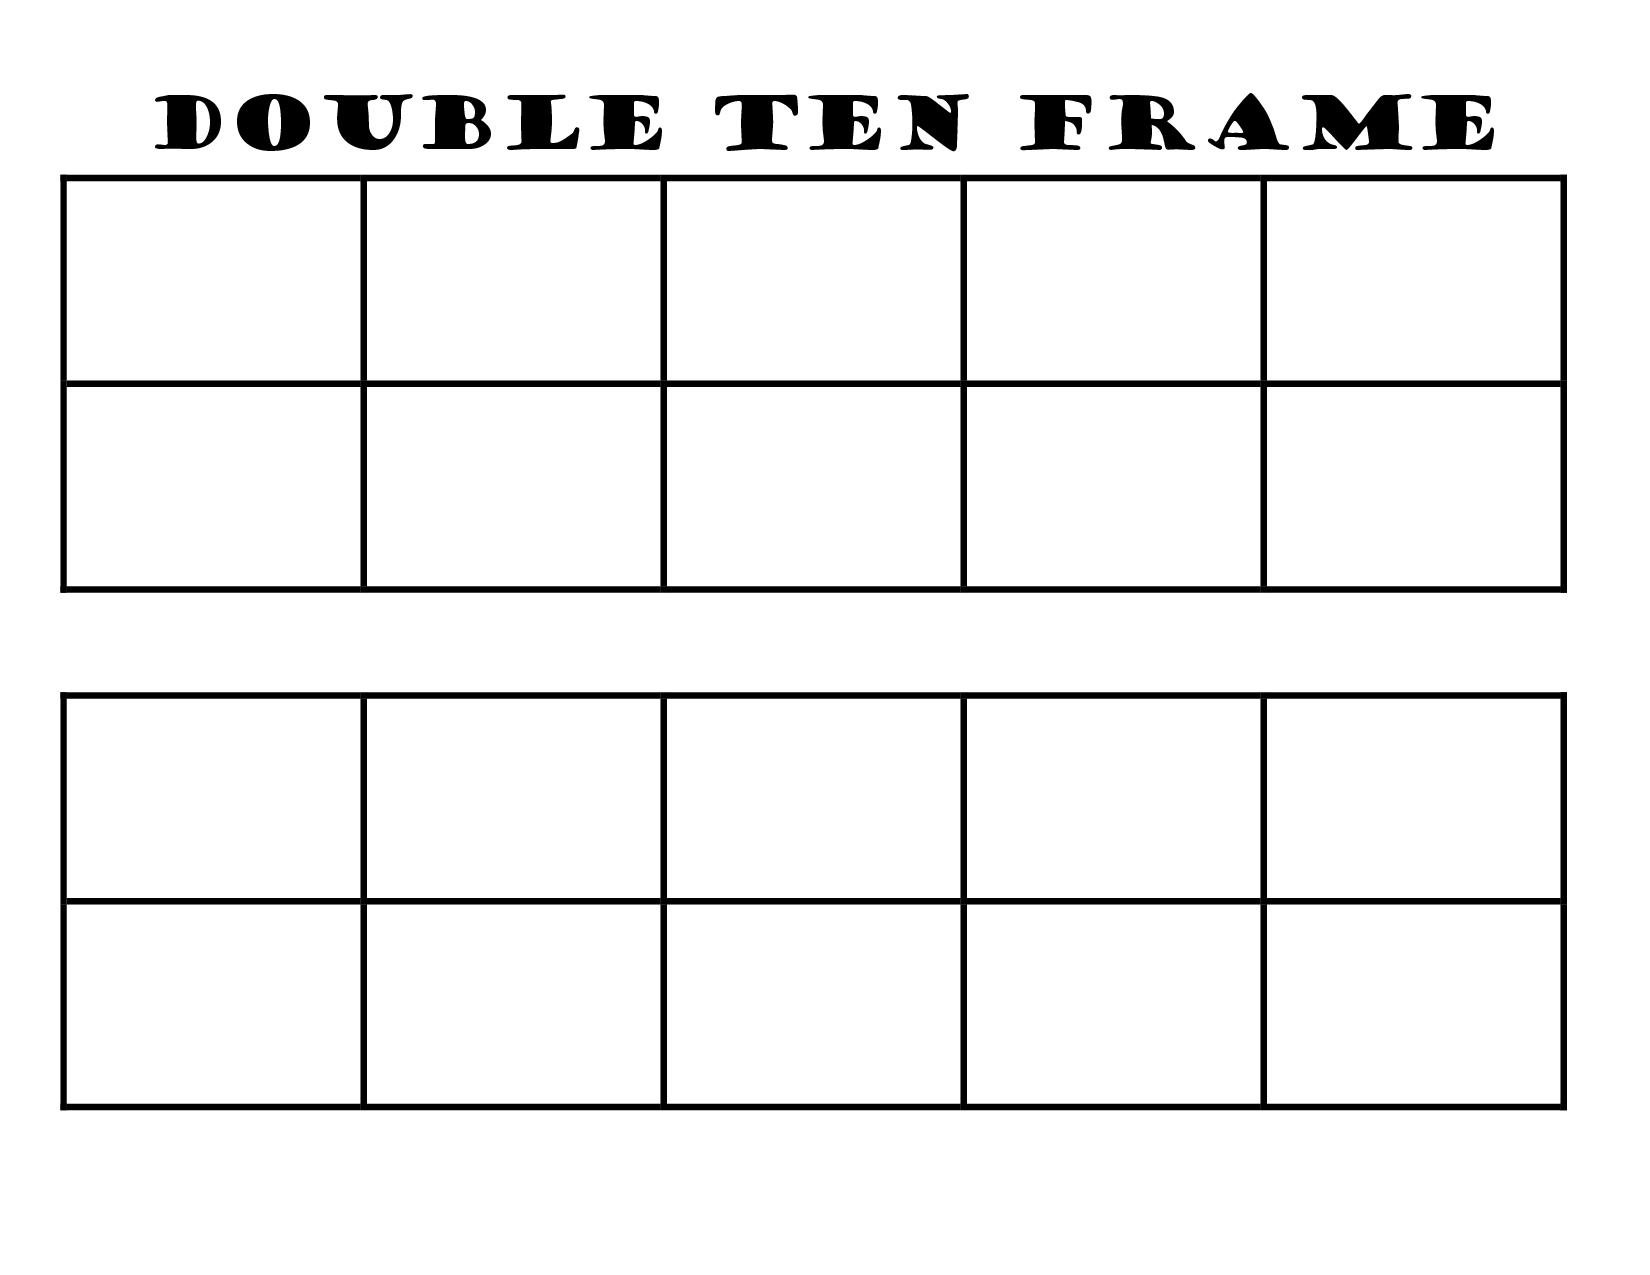 Blank Double Ten Frame Printable